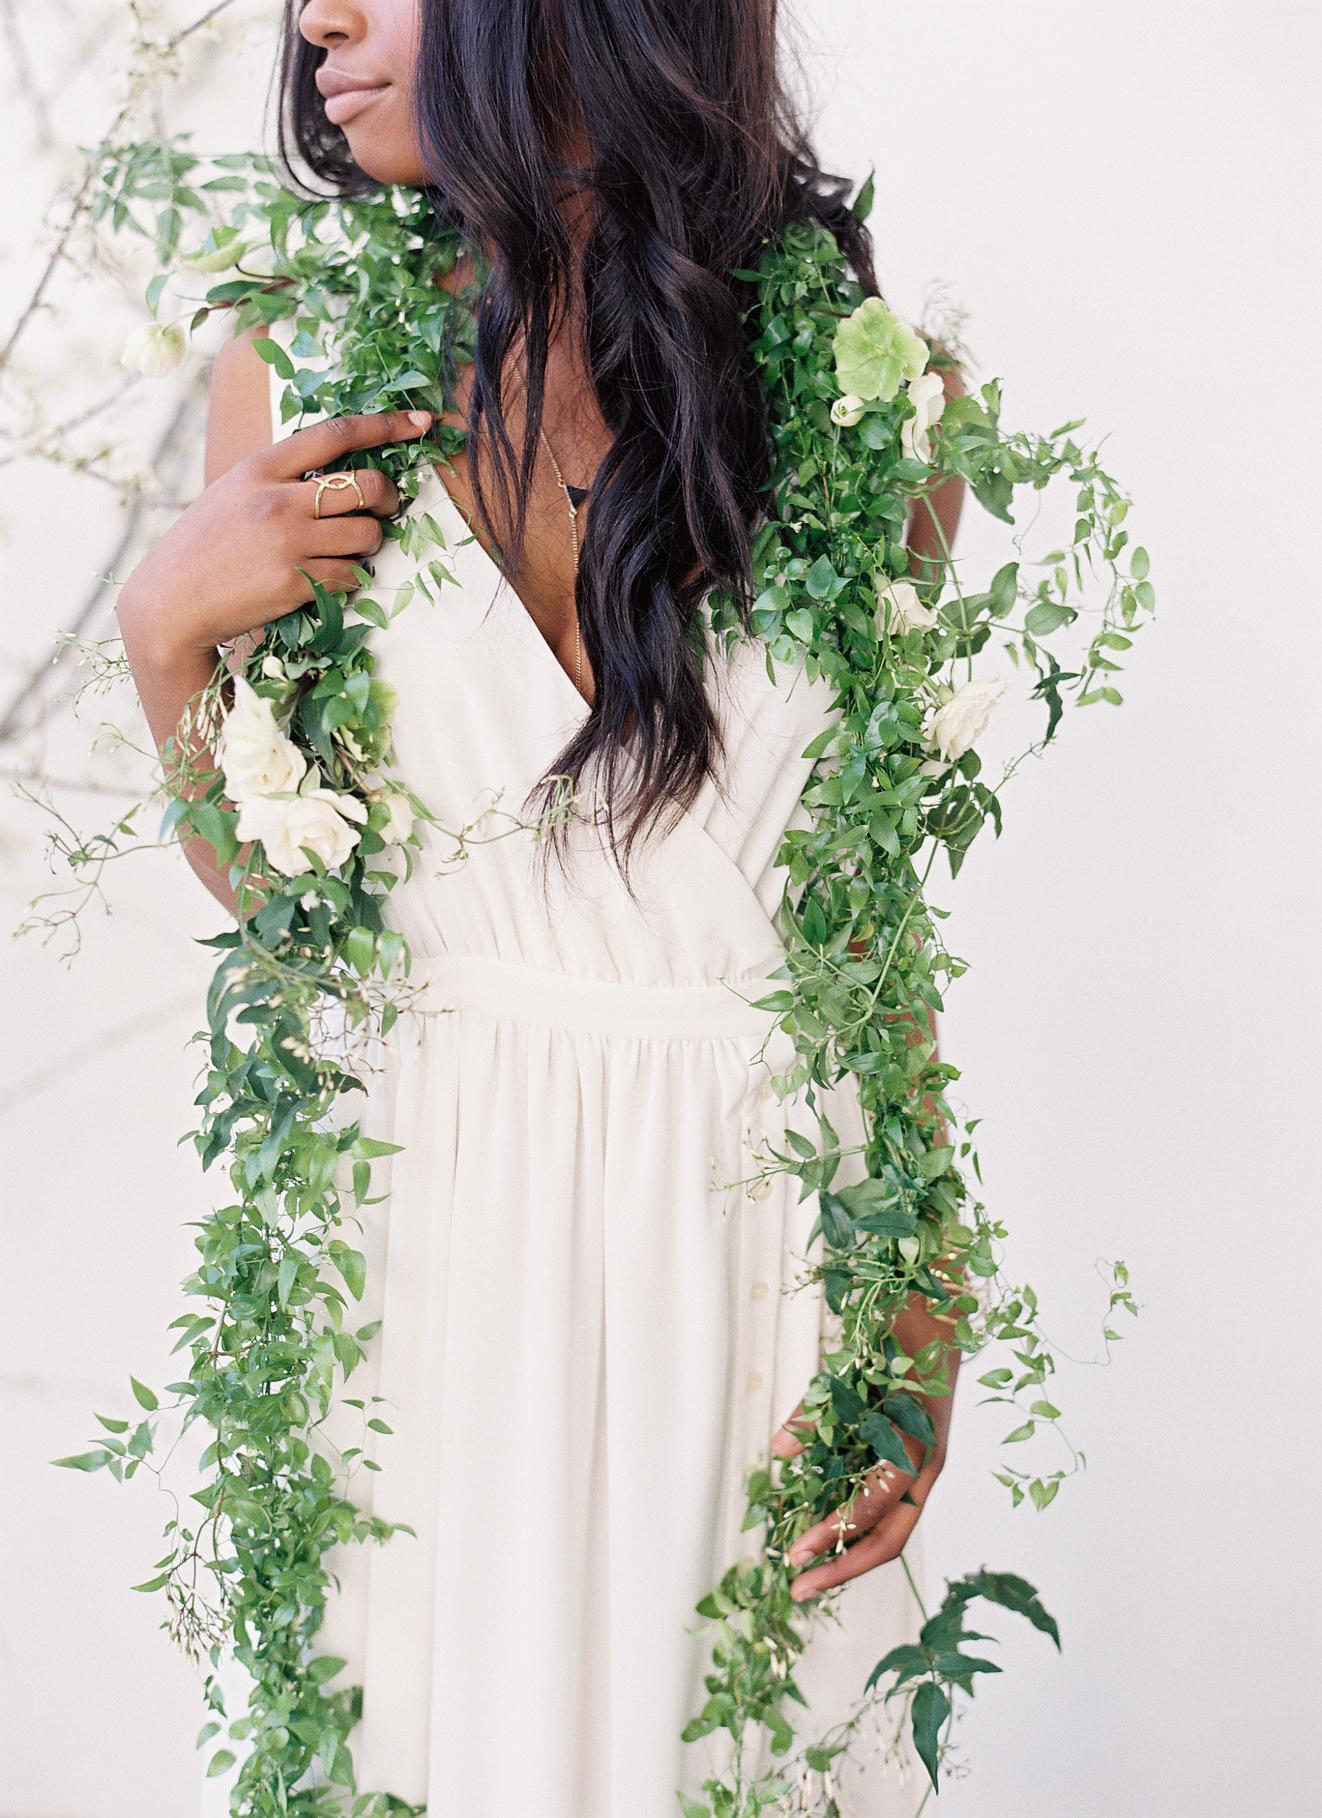 Floralessence-Esmeraldafranco-11.JPG